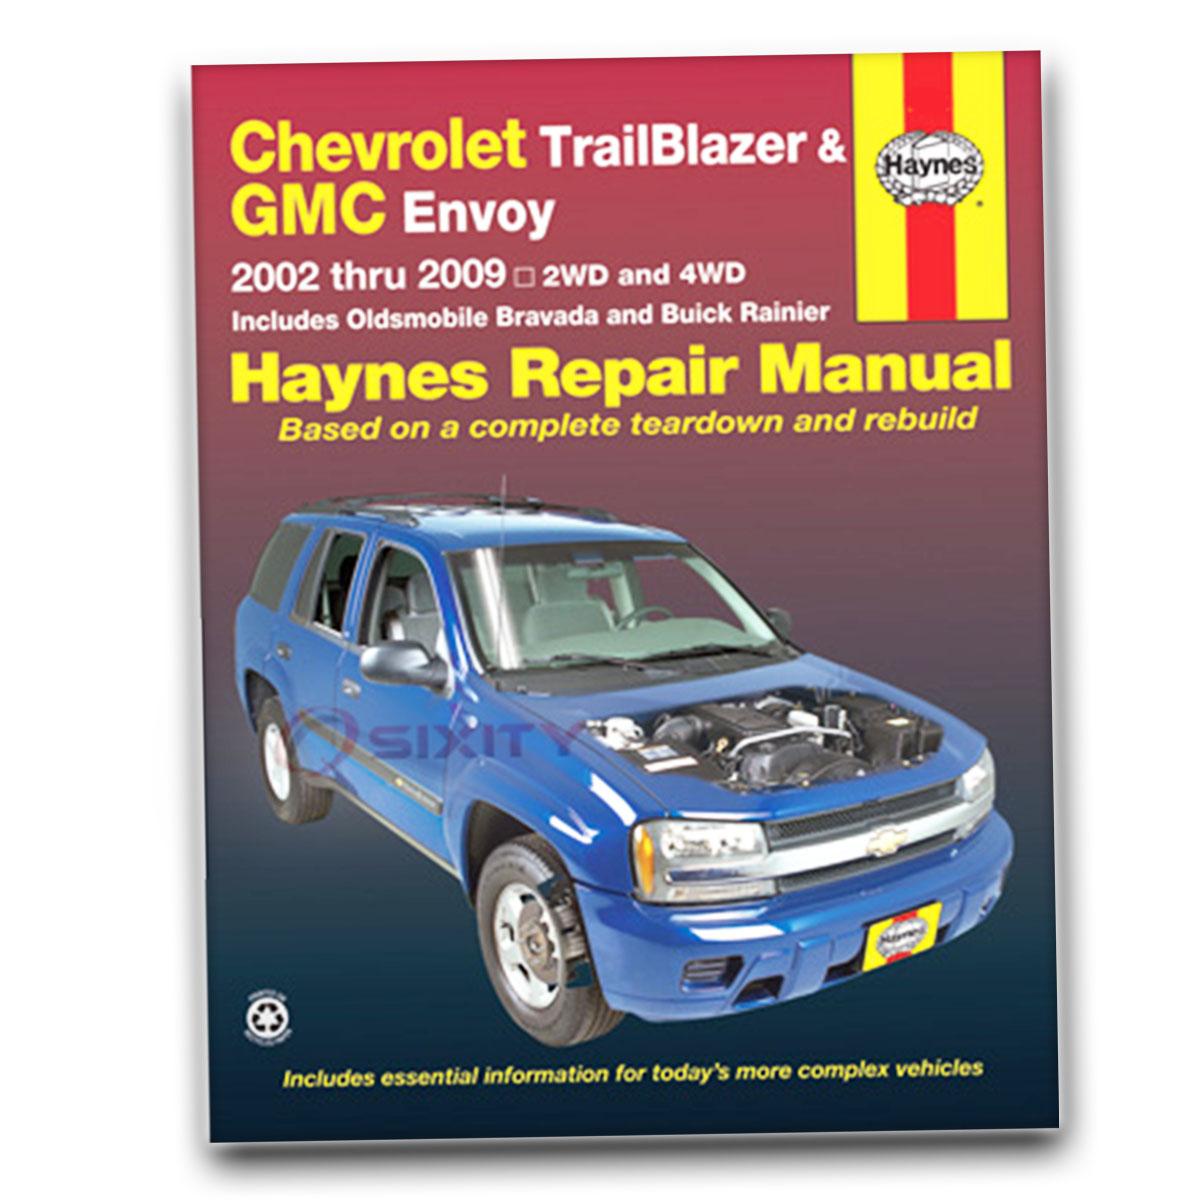 Haynes Repair Manual 24072 for Chevrolet TrailBlazer GMC Envoy Buick Rainer  lz